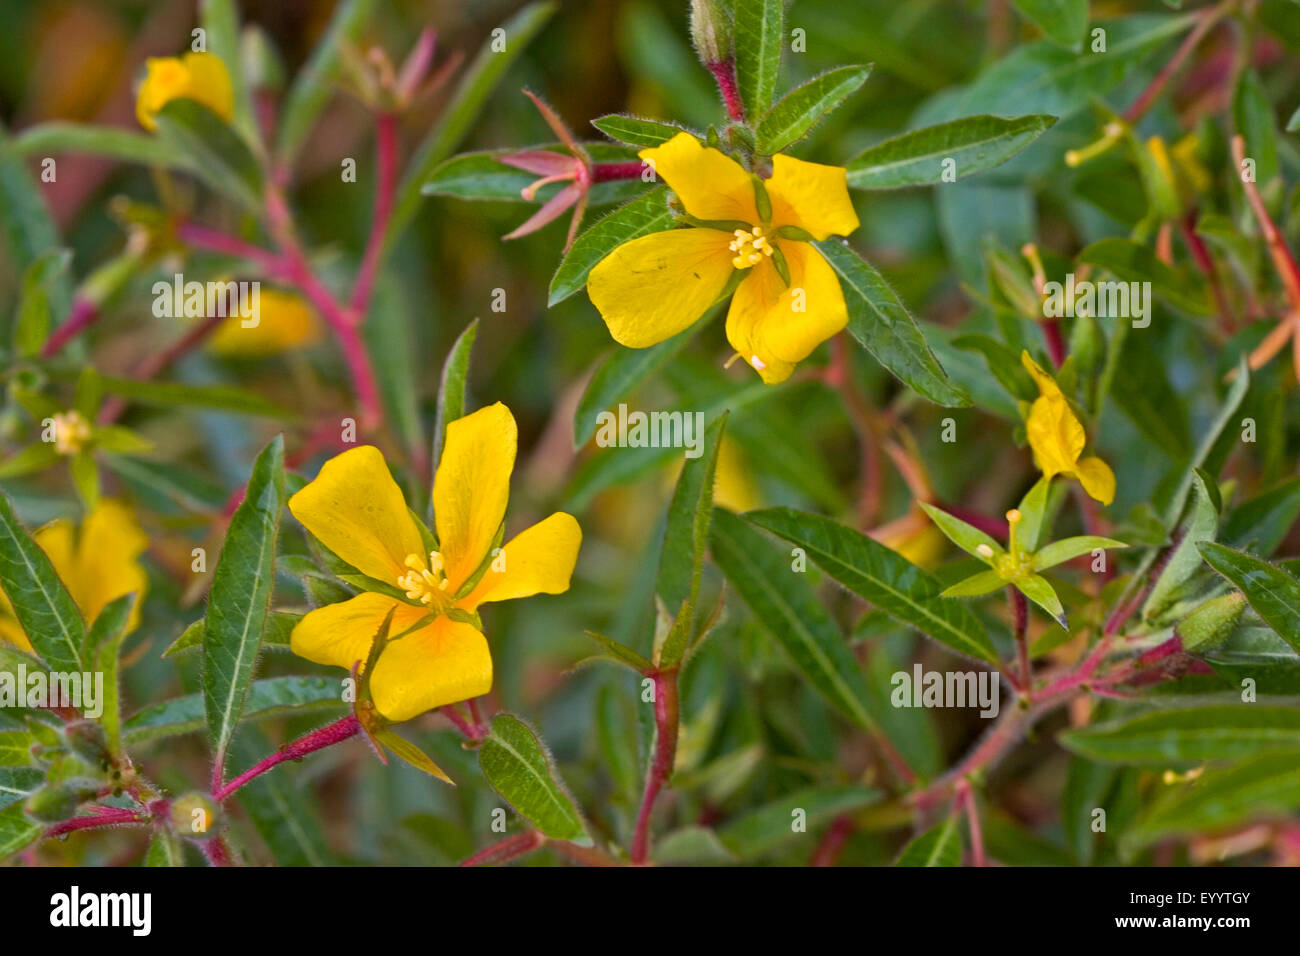 Acqua perenne primrose, Uruguay waterprimrose (Ludwigia grandiflora, Ludwigia uruguayensis, Jussiaea grandiflora), Immagini Stock